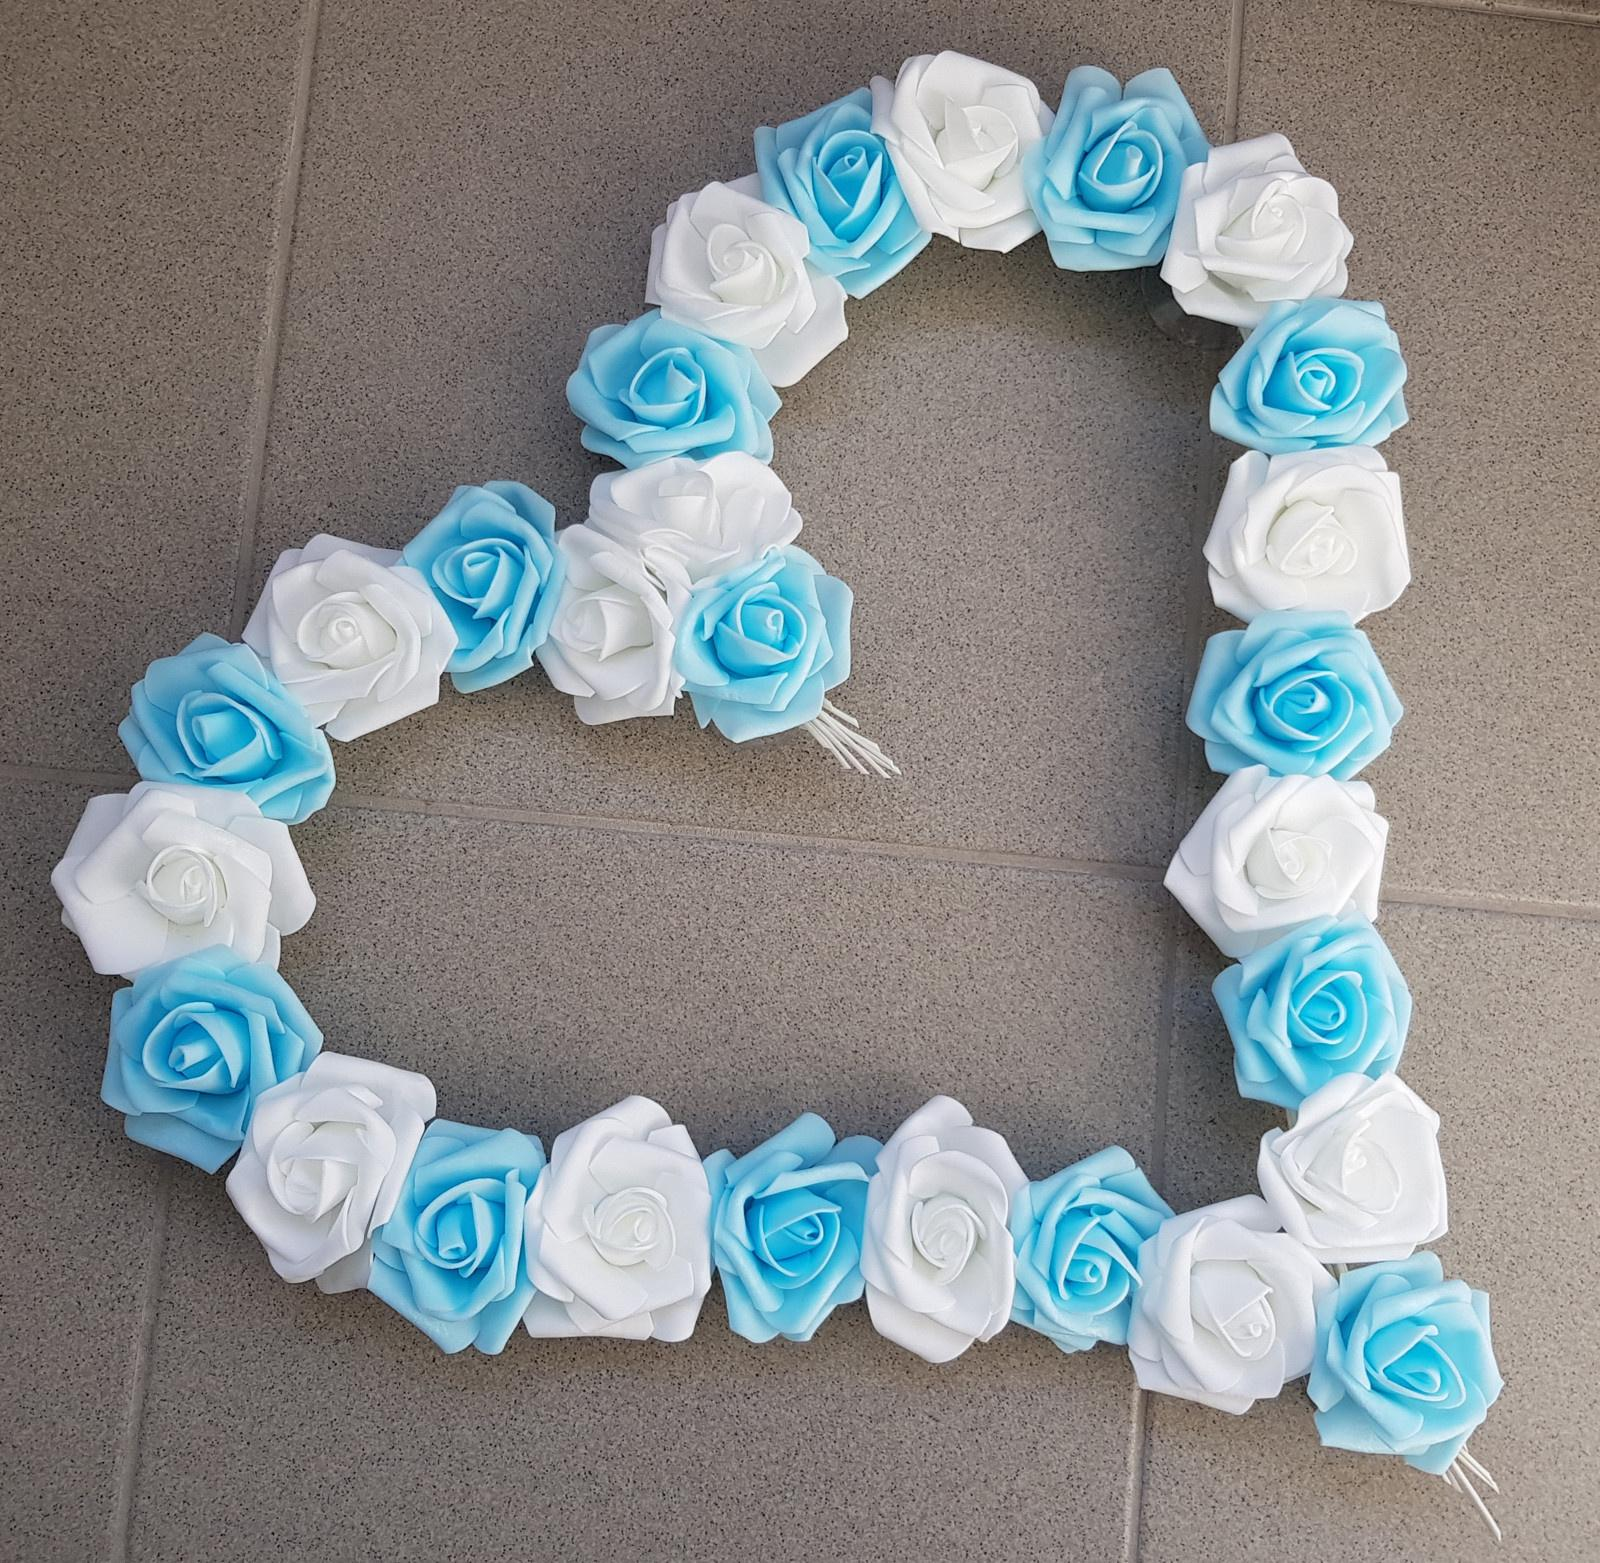 Pedigové srdce na kapotu bílá a modrá - Obrázek č. 1